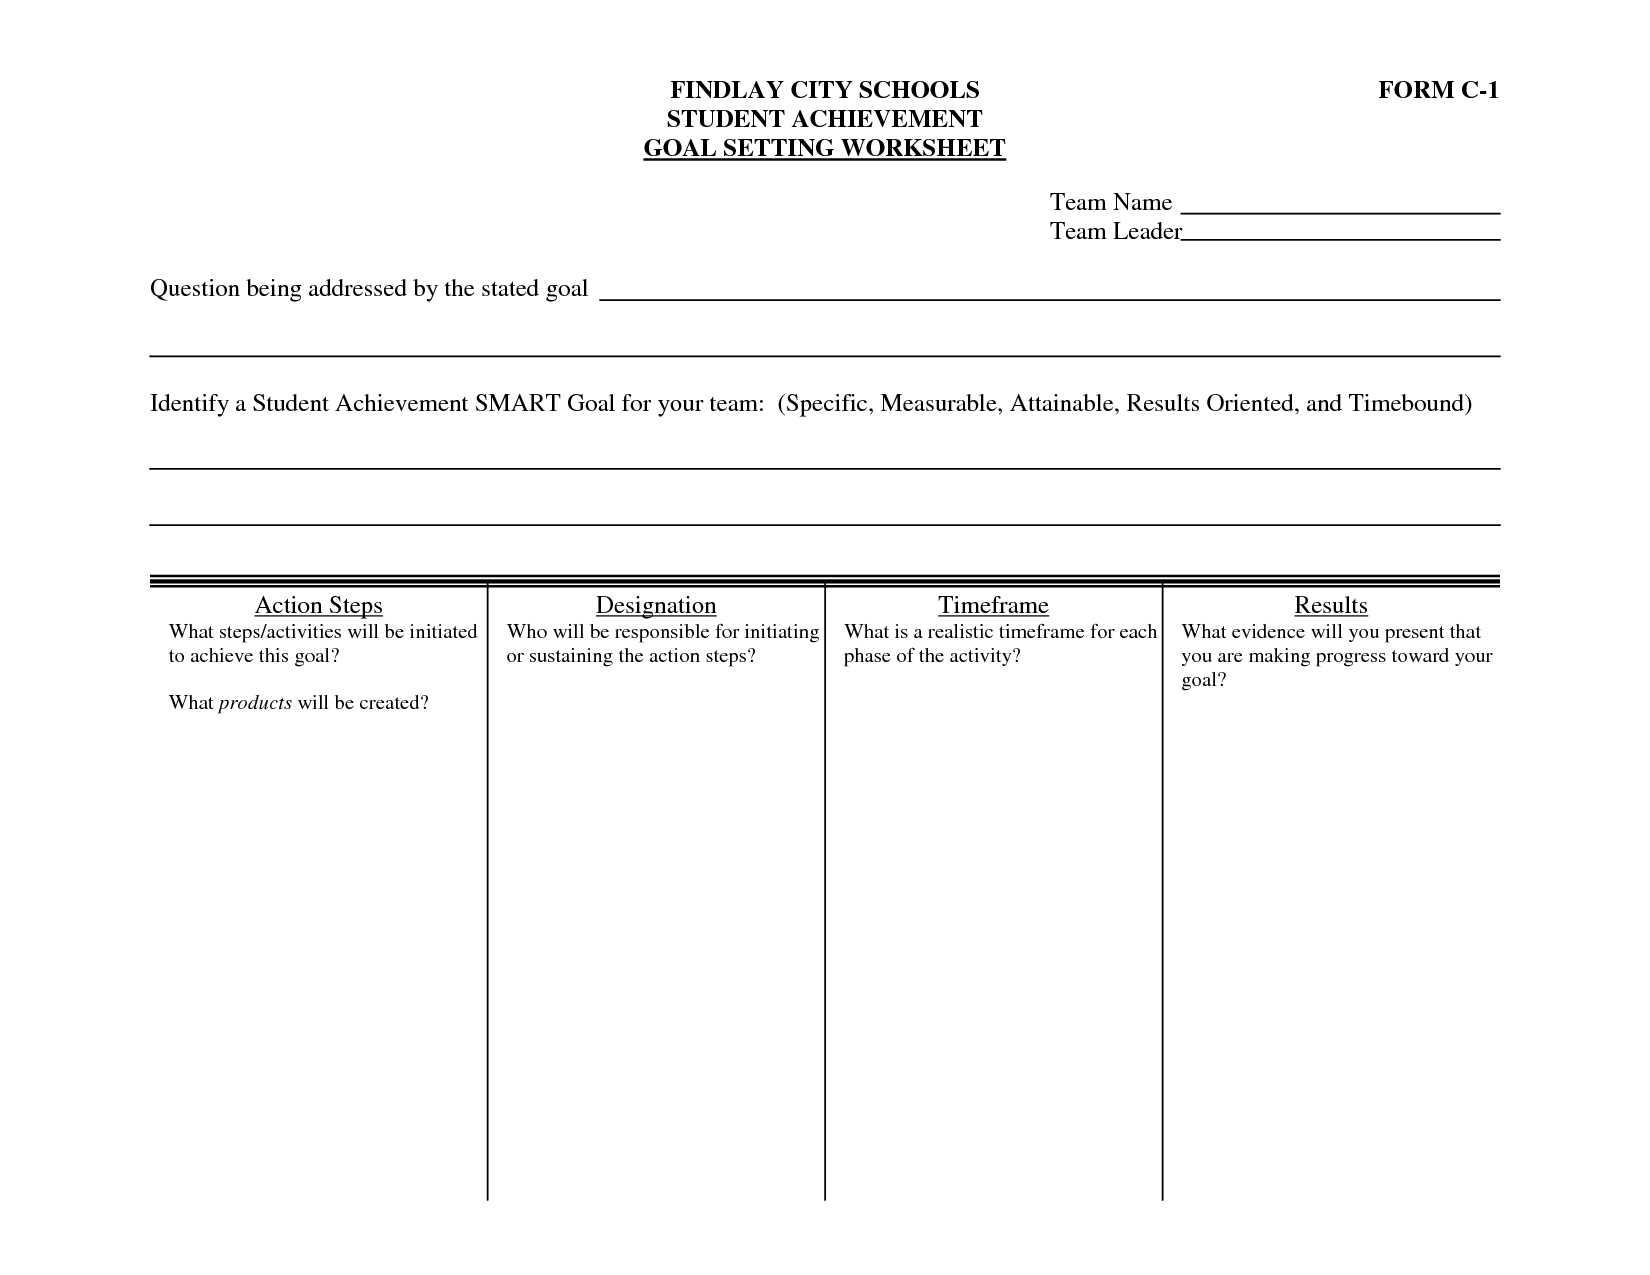 Middle School Student Goal Setting Worksheet